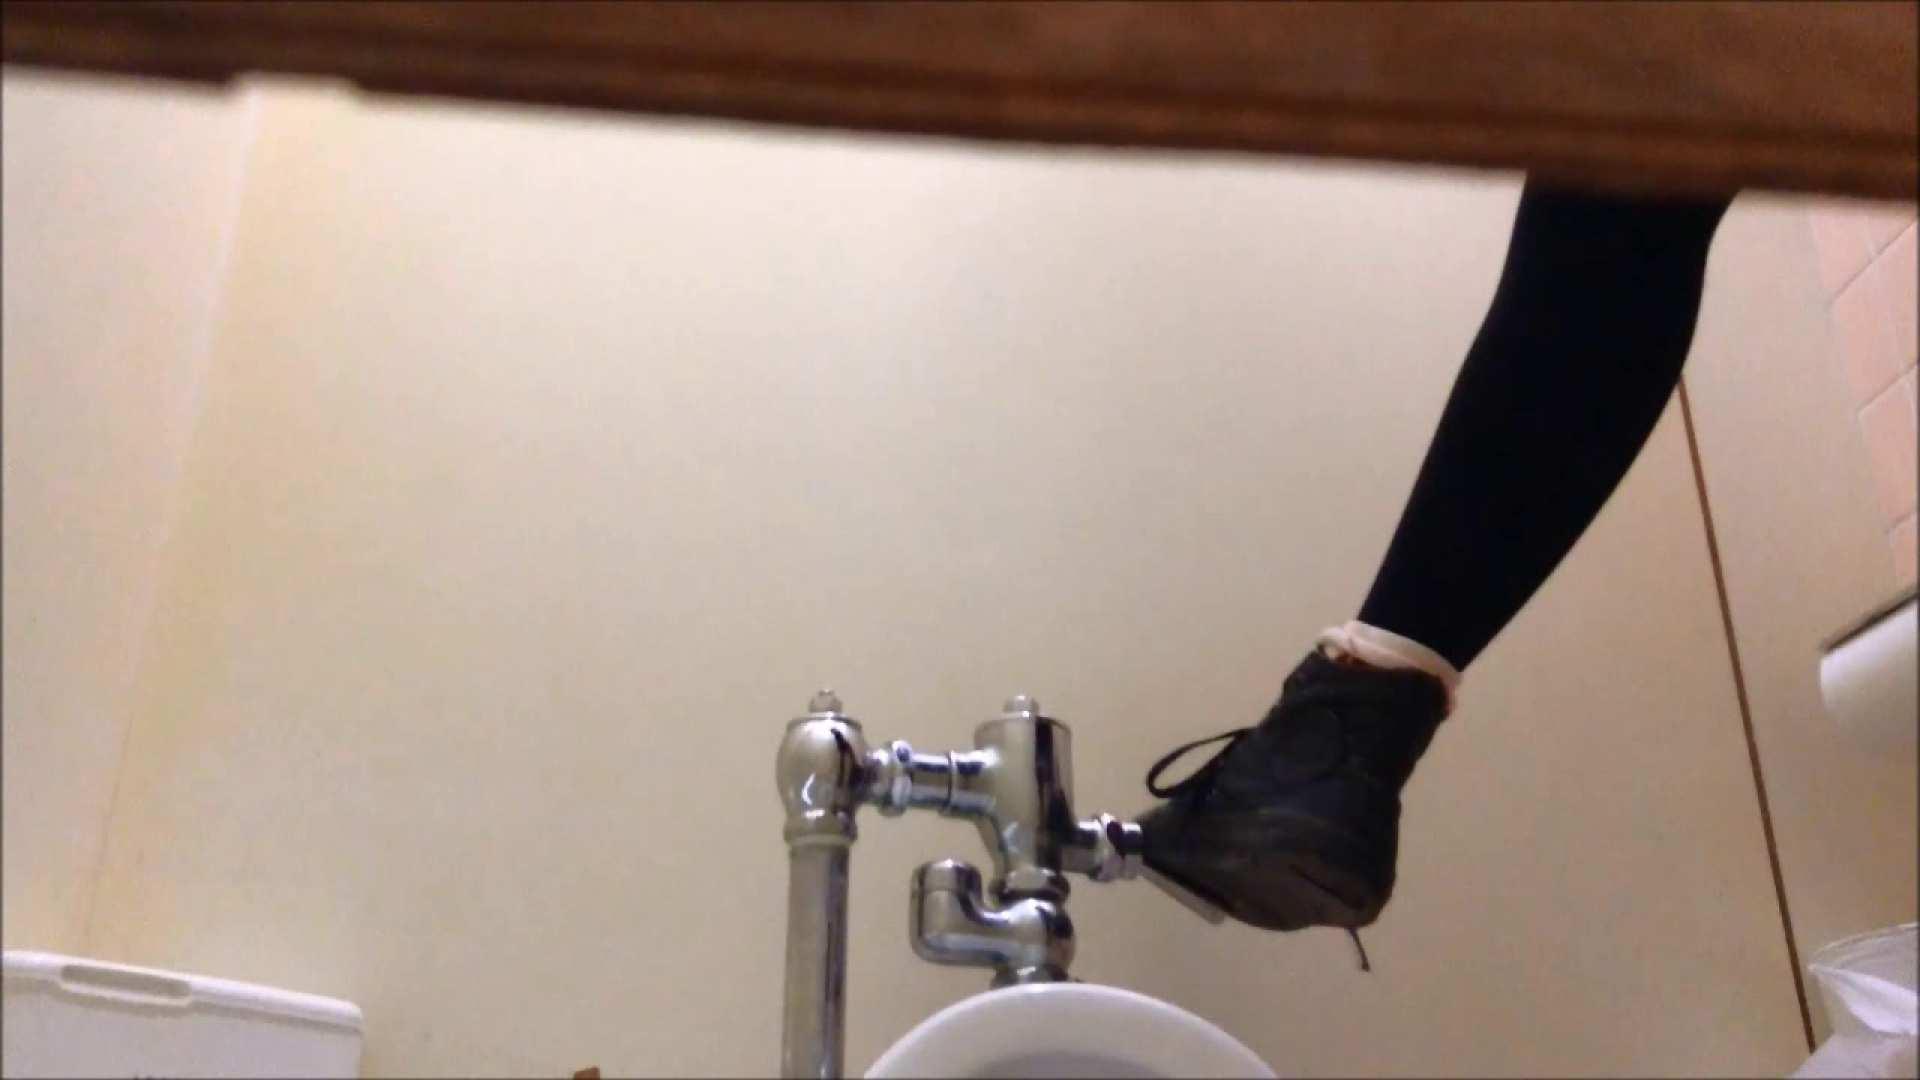 某有名大学女性洗面所 vol.12 和式・女子用 おまんこ無修正動画無料 96画像 78